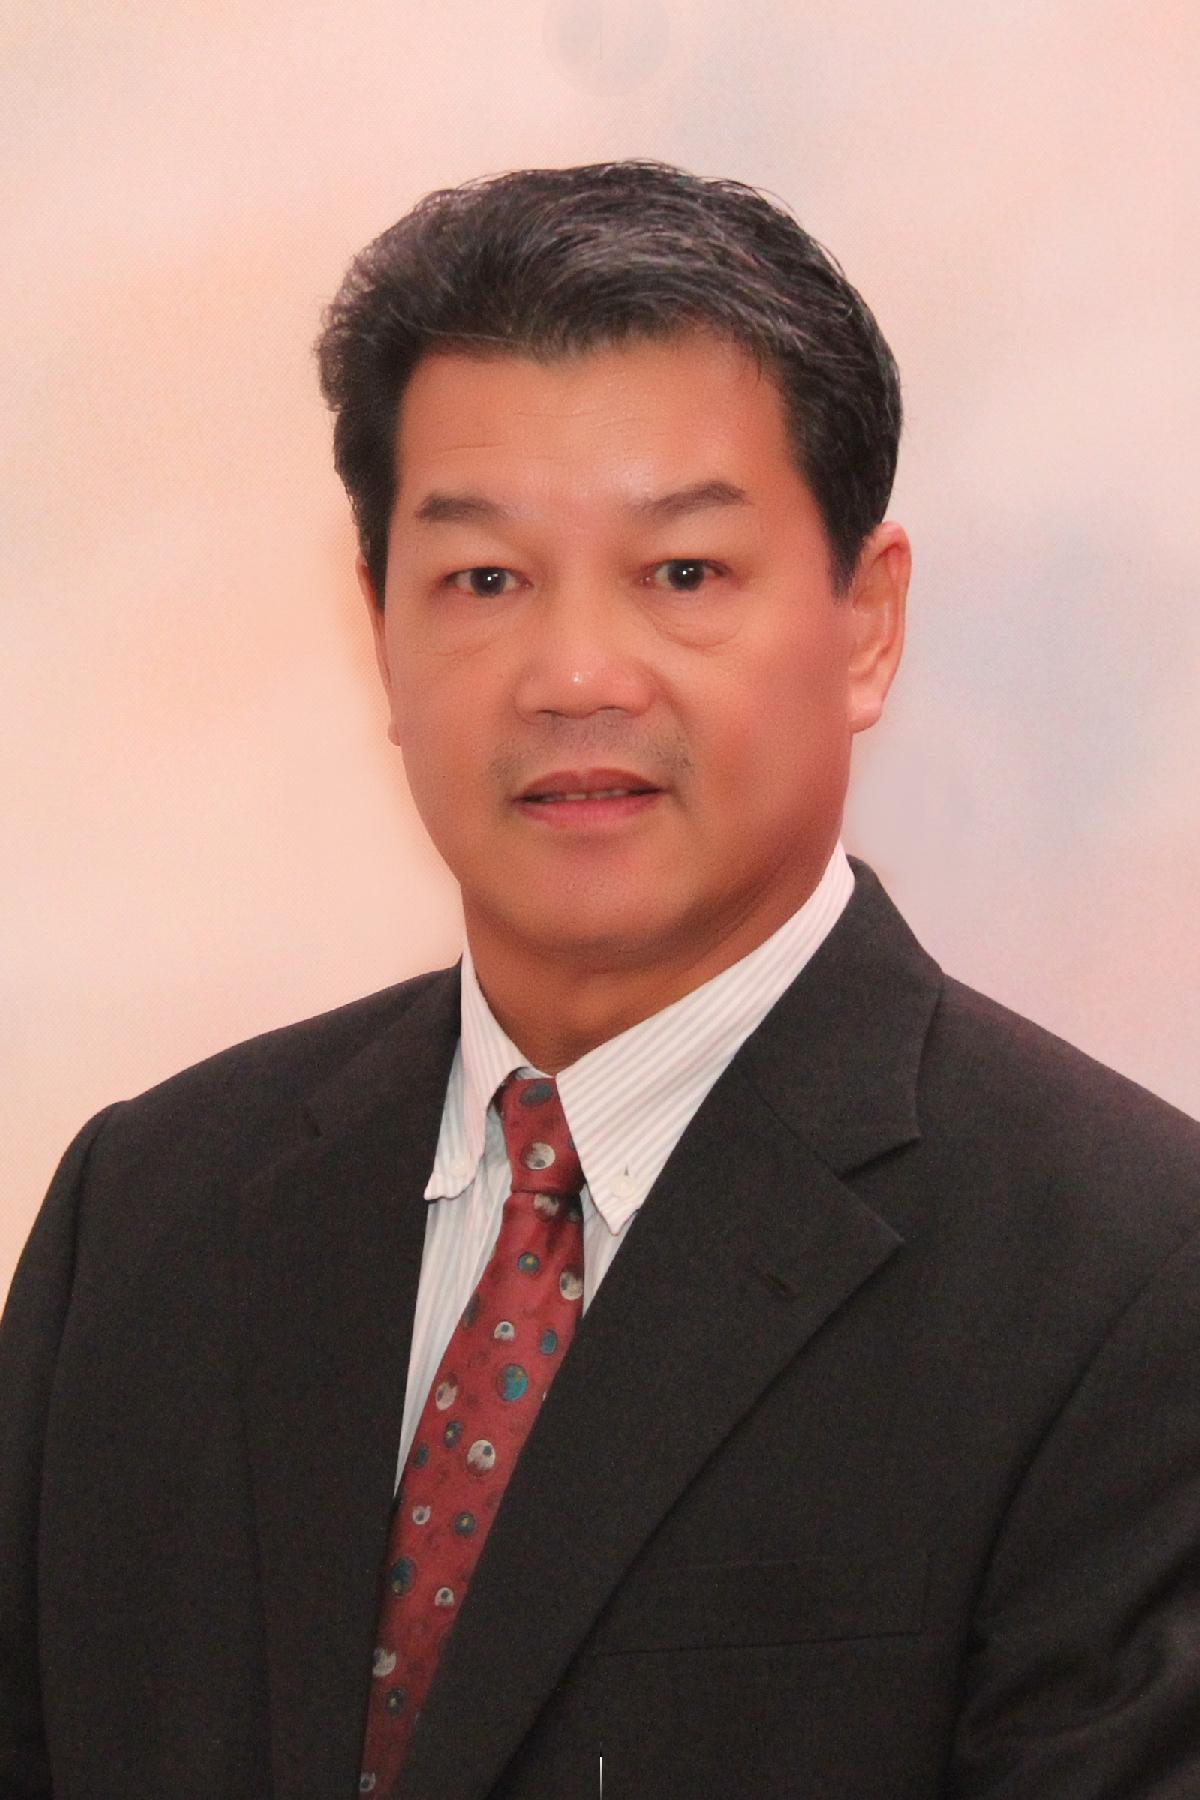 <h80>李廷亮</h80><br>Henry Lee Ting Leong